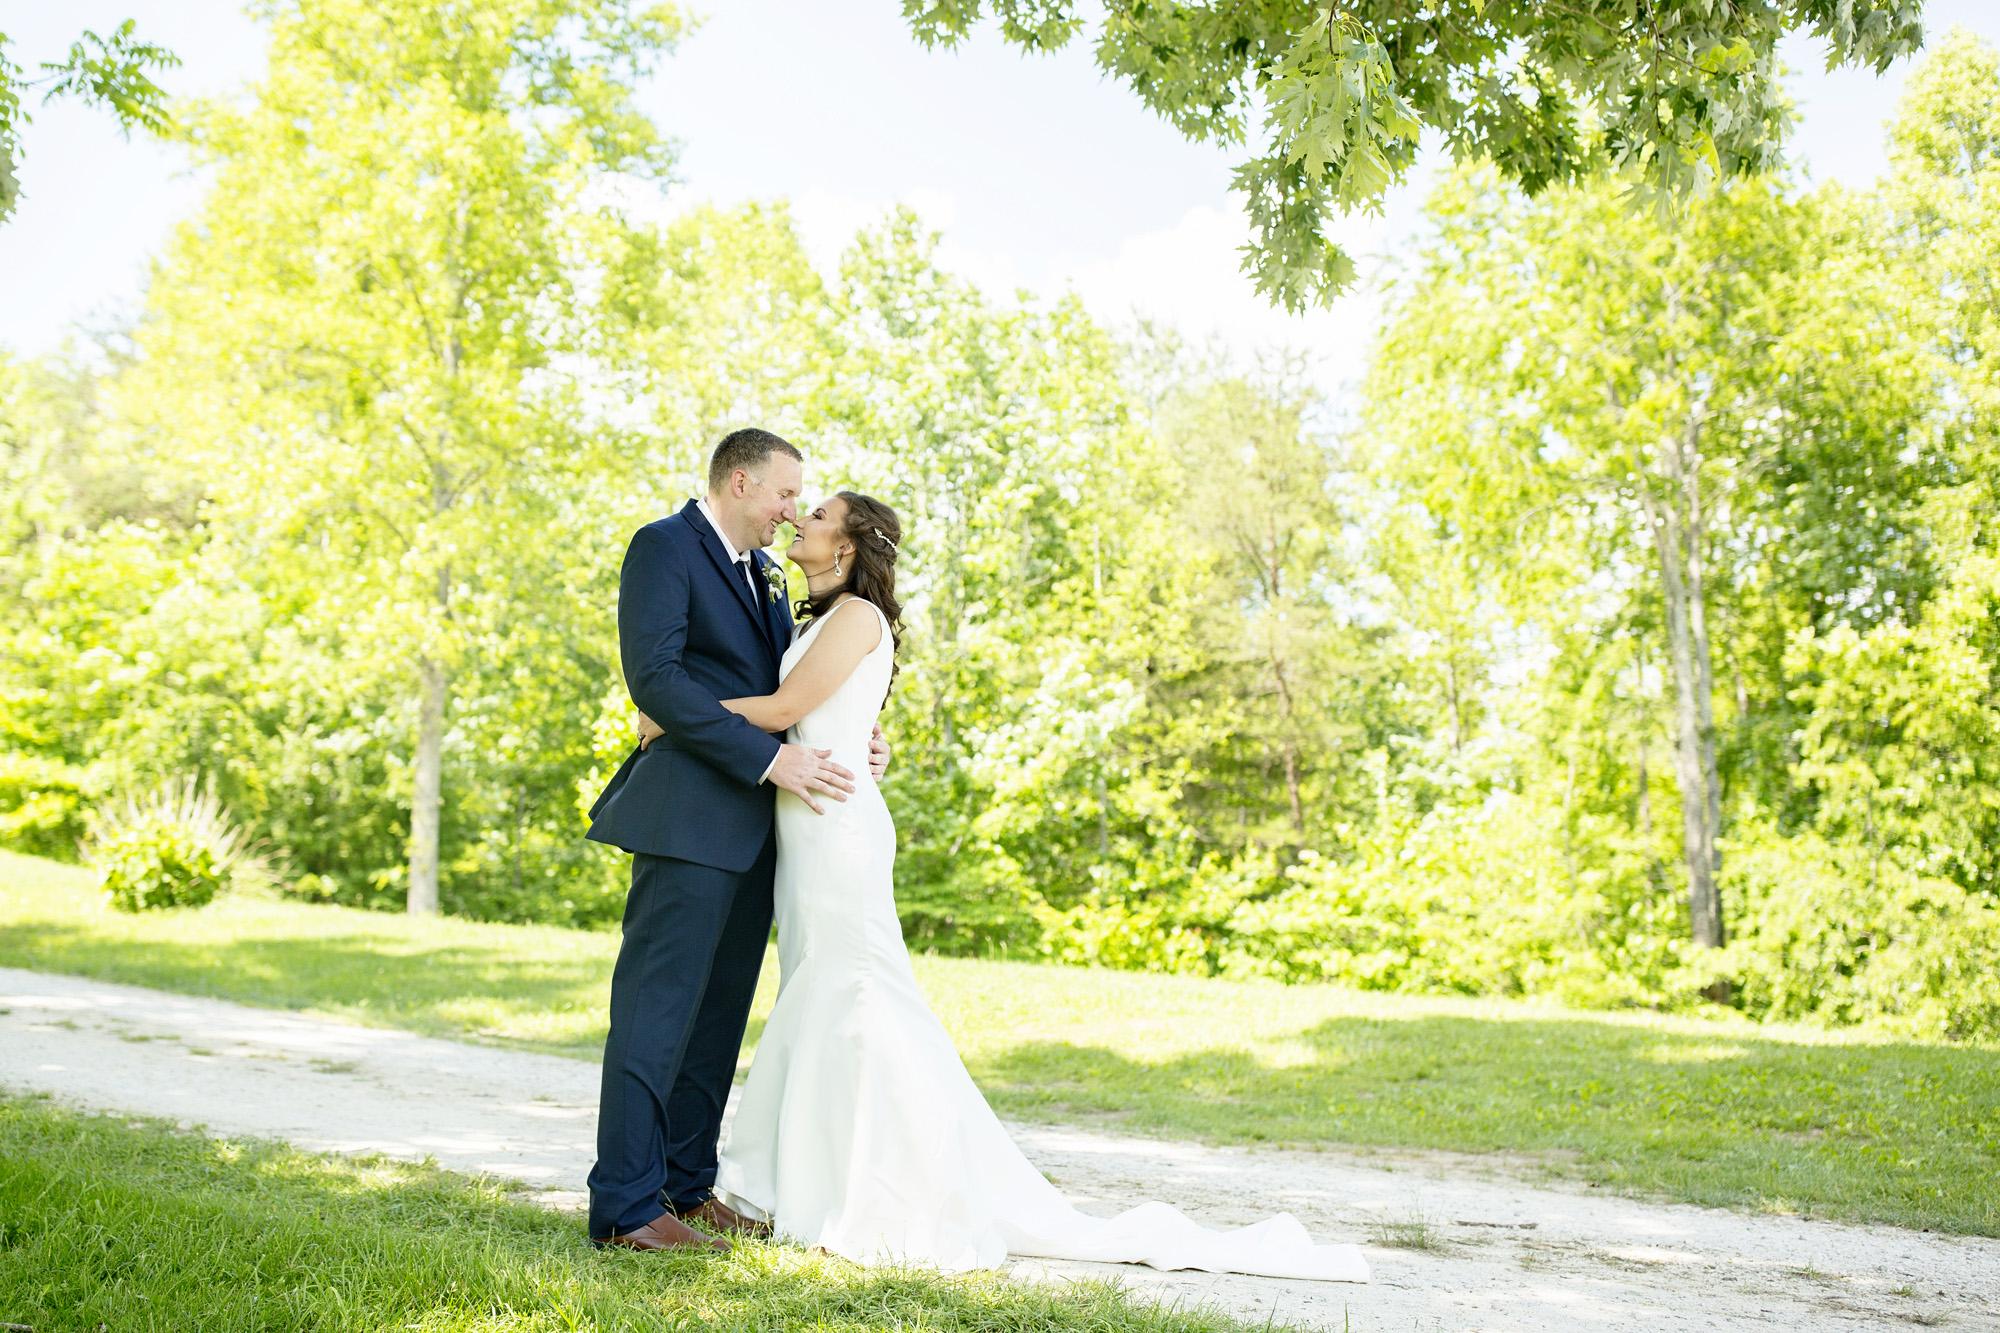 Seriously_Sabrina_Photography_Red_River_Gorge_Wedding_Barn_Robinson32.jpg